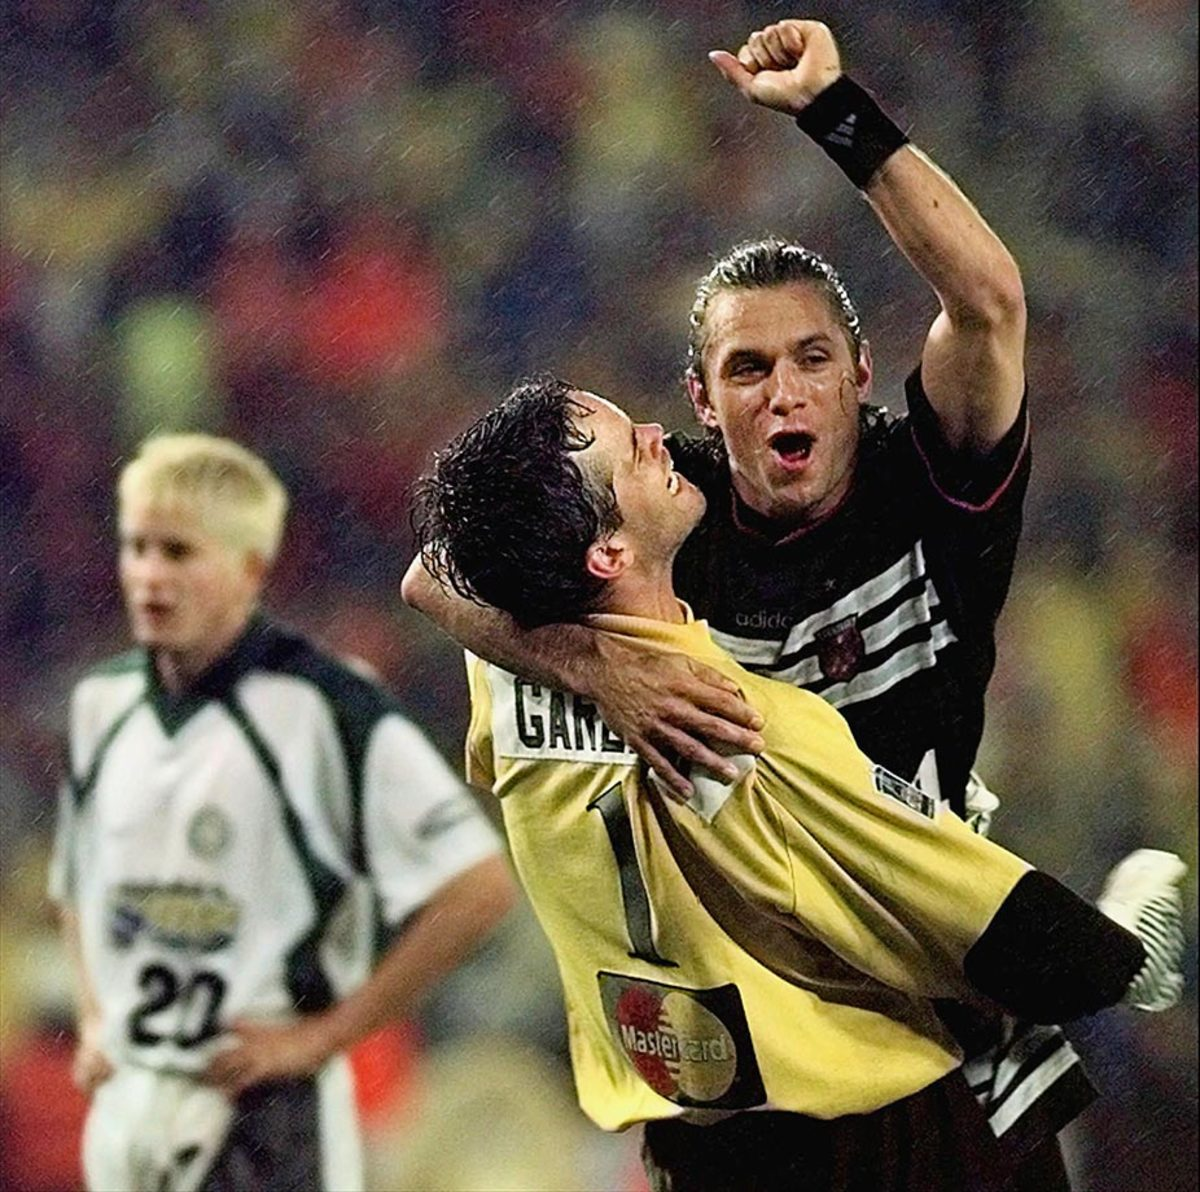 1997-MLS-Cup-DC-United-David-Vaudreuil-Scott-Garlick.jpg